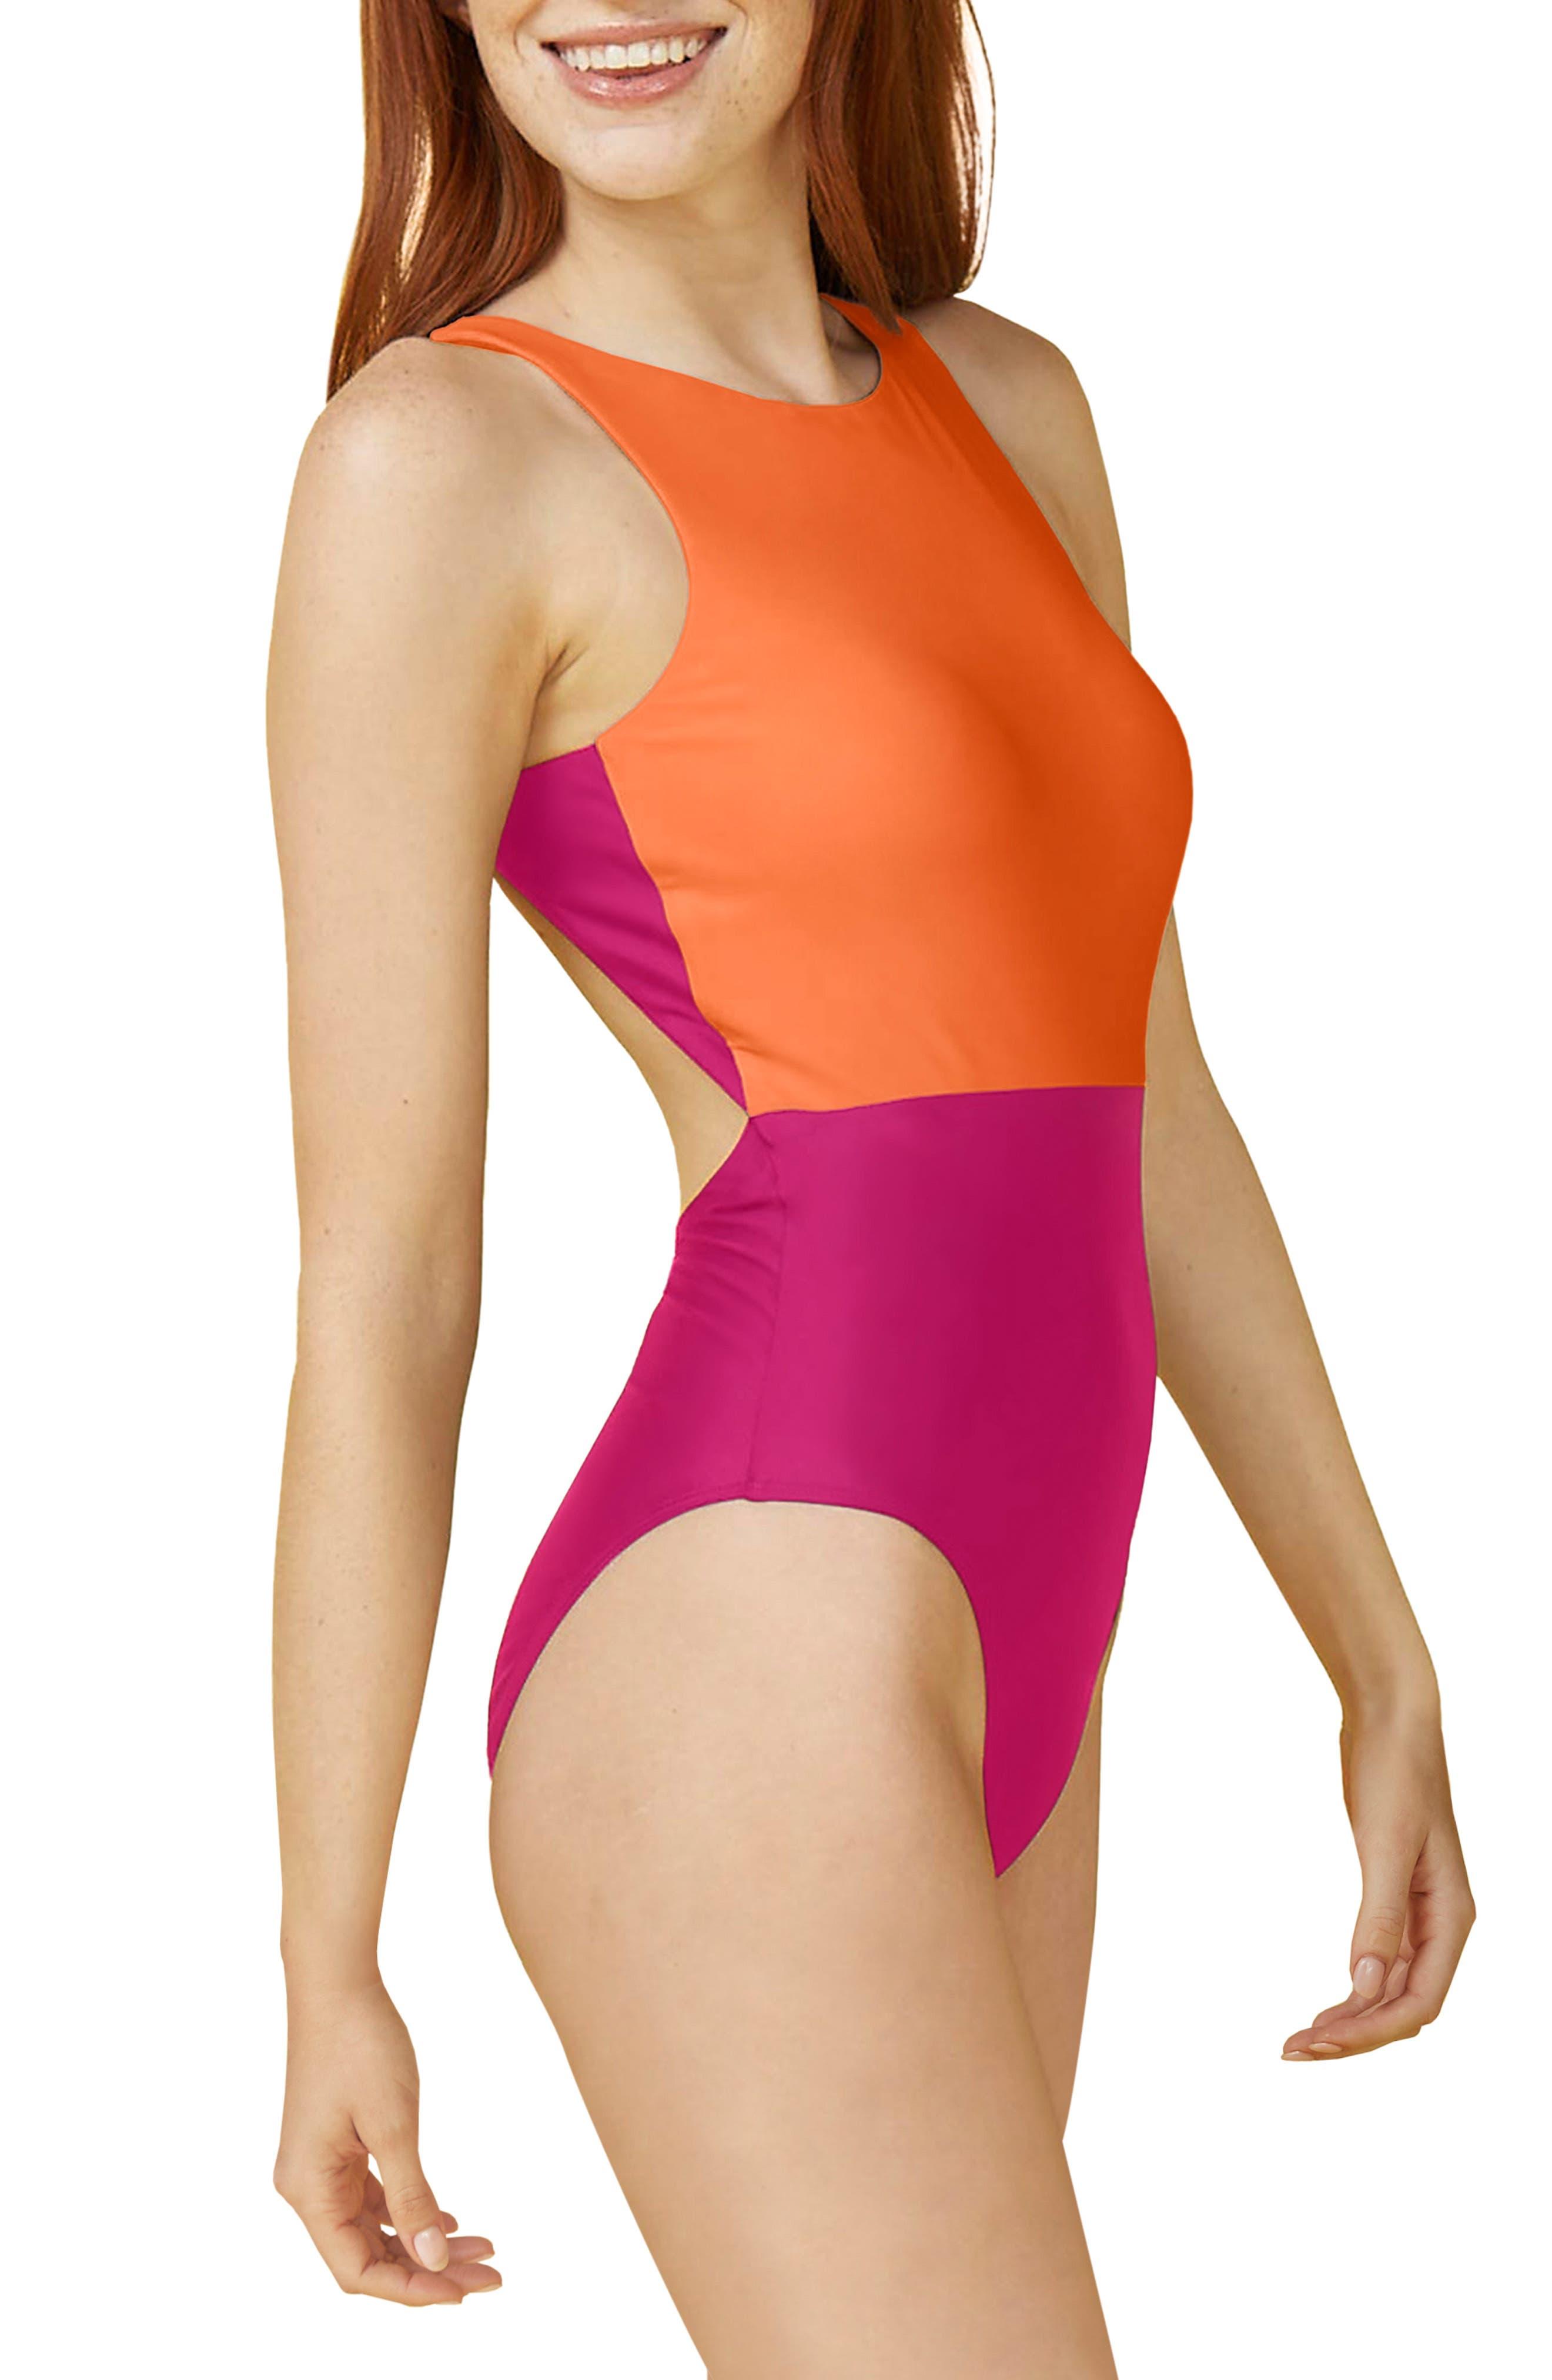 Summersalt The Cove One-Piece Swimsuit (Regular & Plus Size)